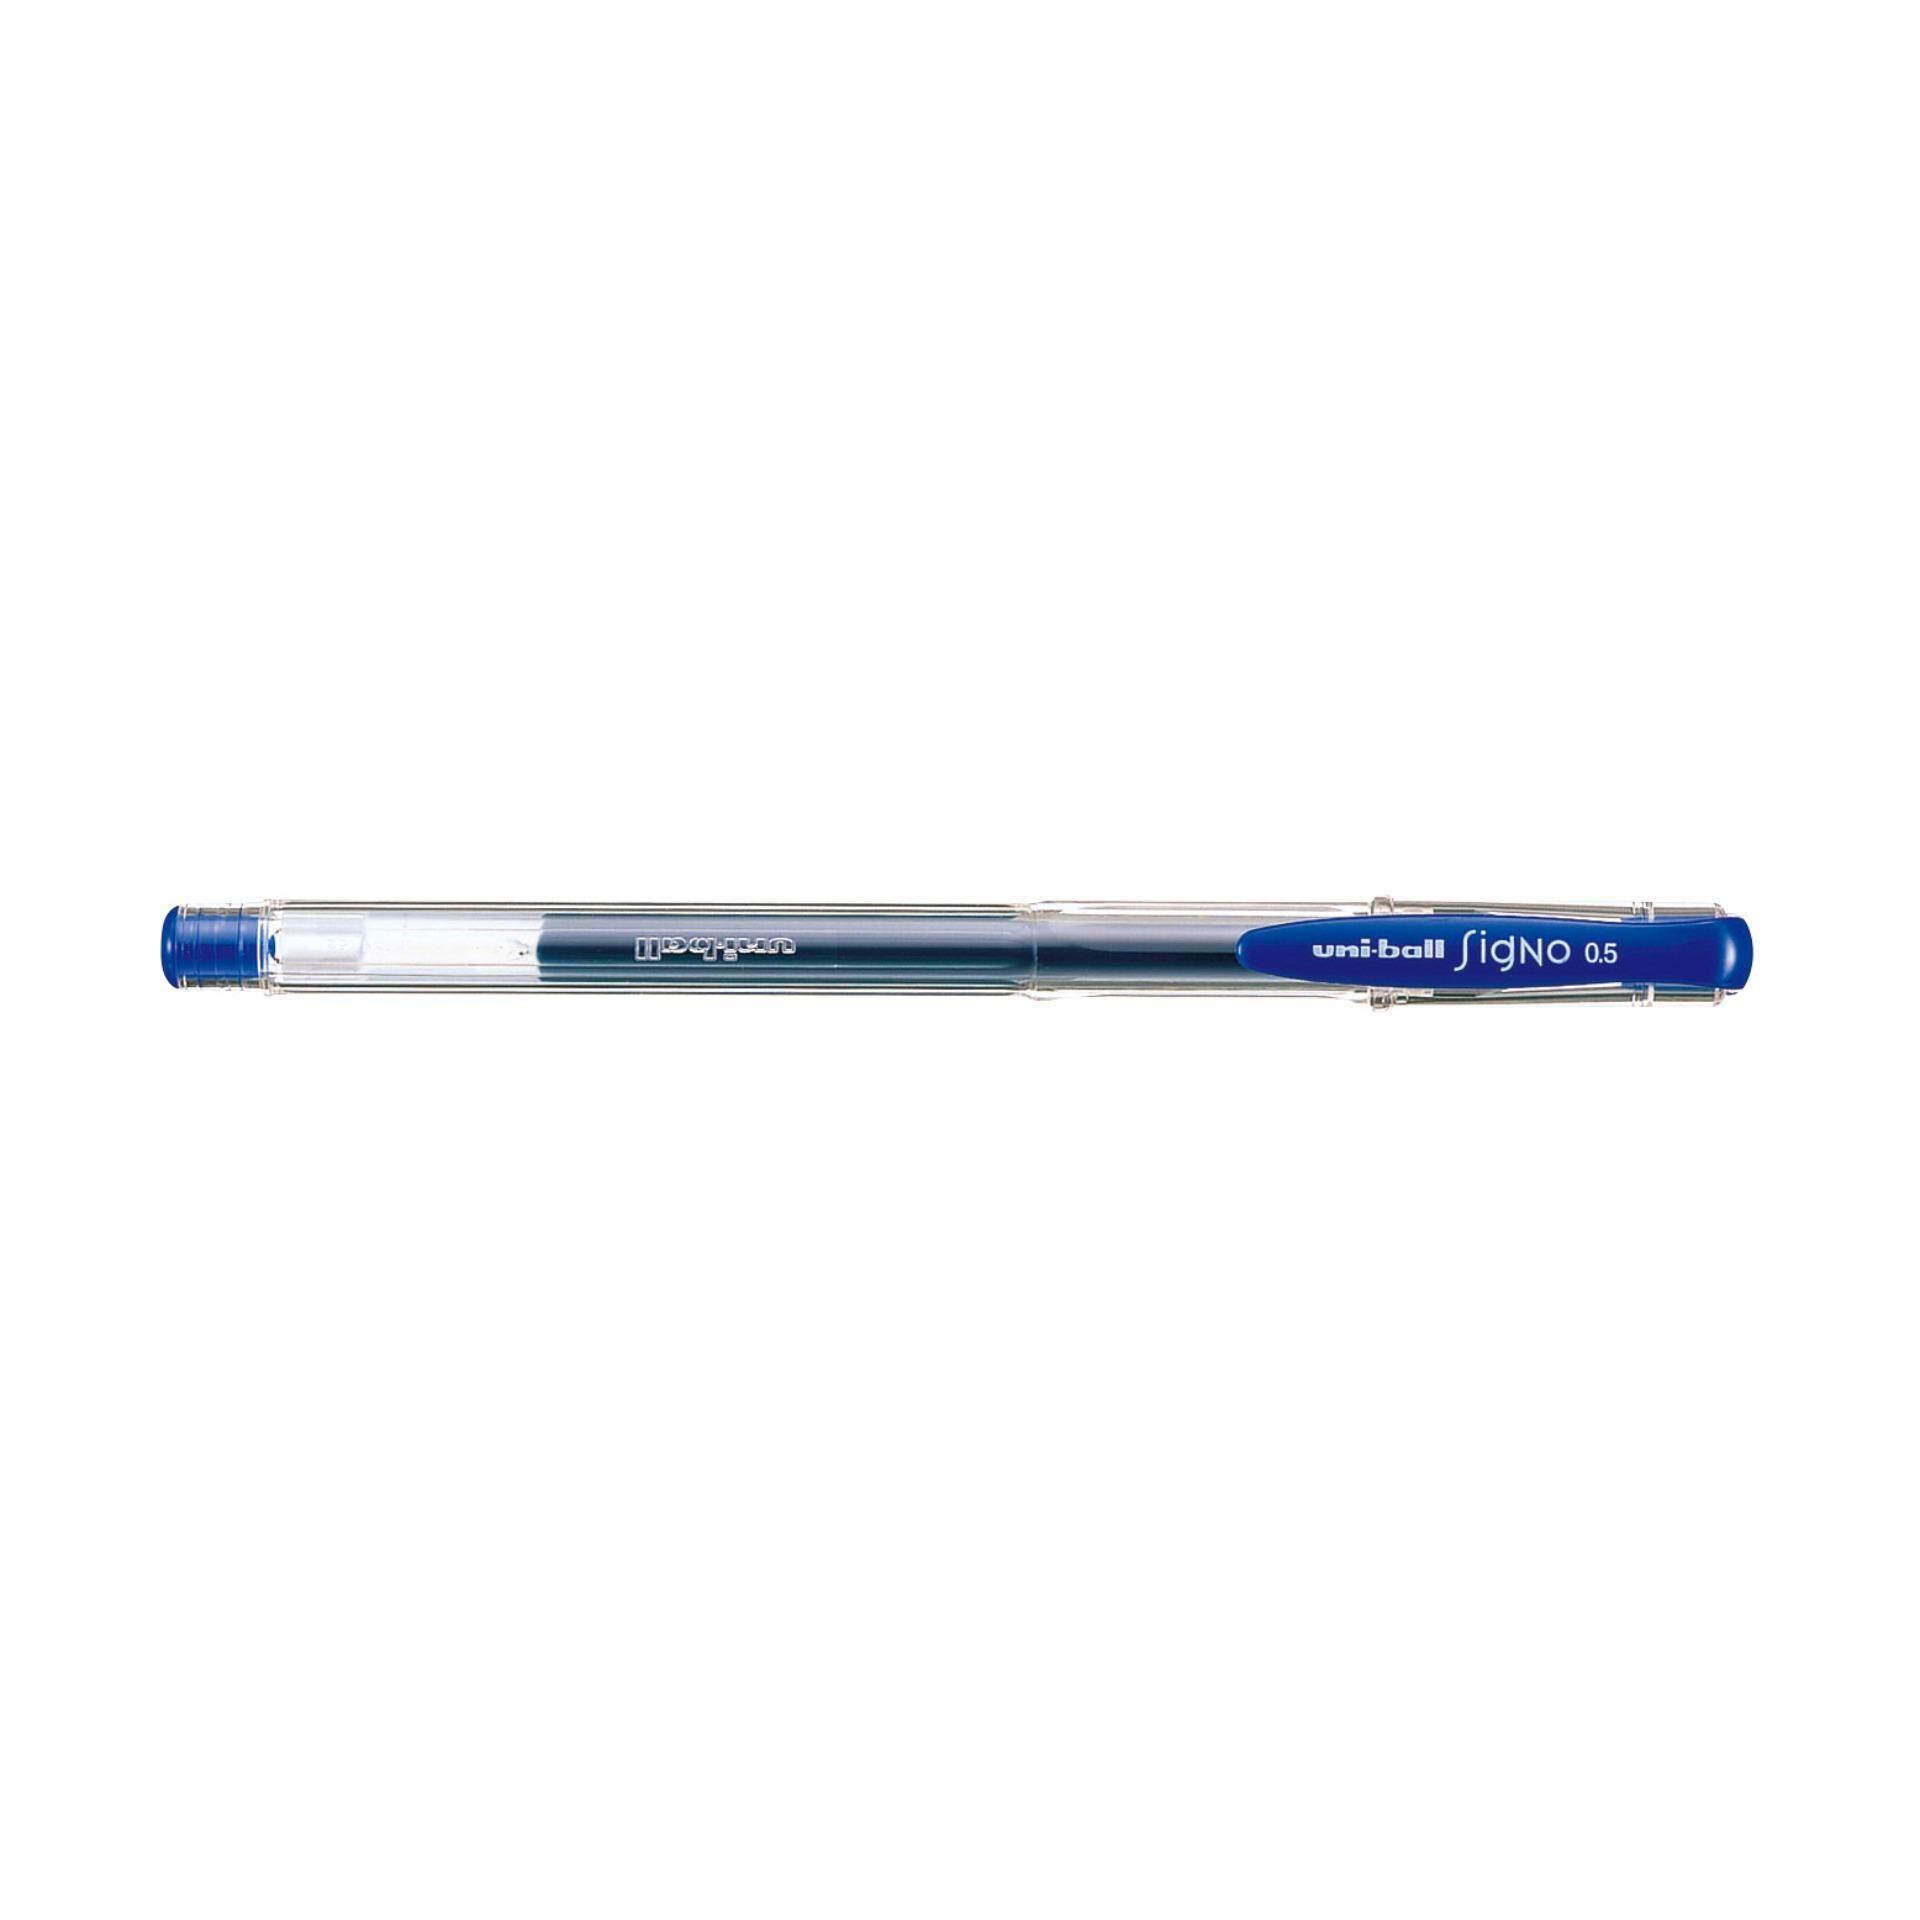 Uniball SIGNO Roller Gel Pen 12pcs/box 0.5mm (Blue Ink)